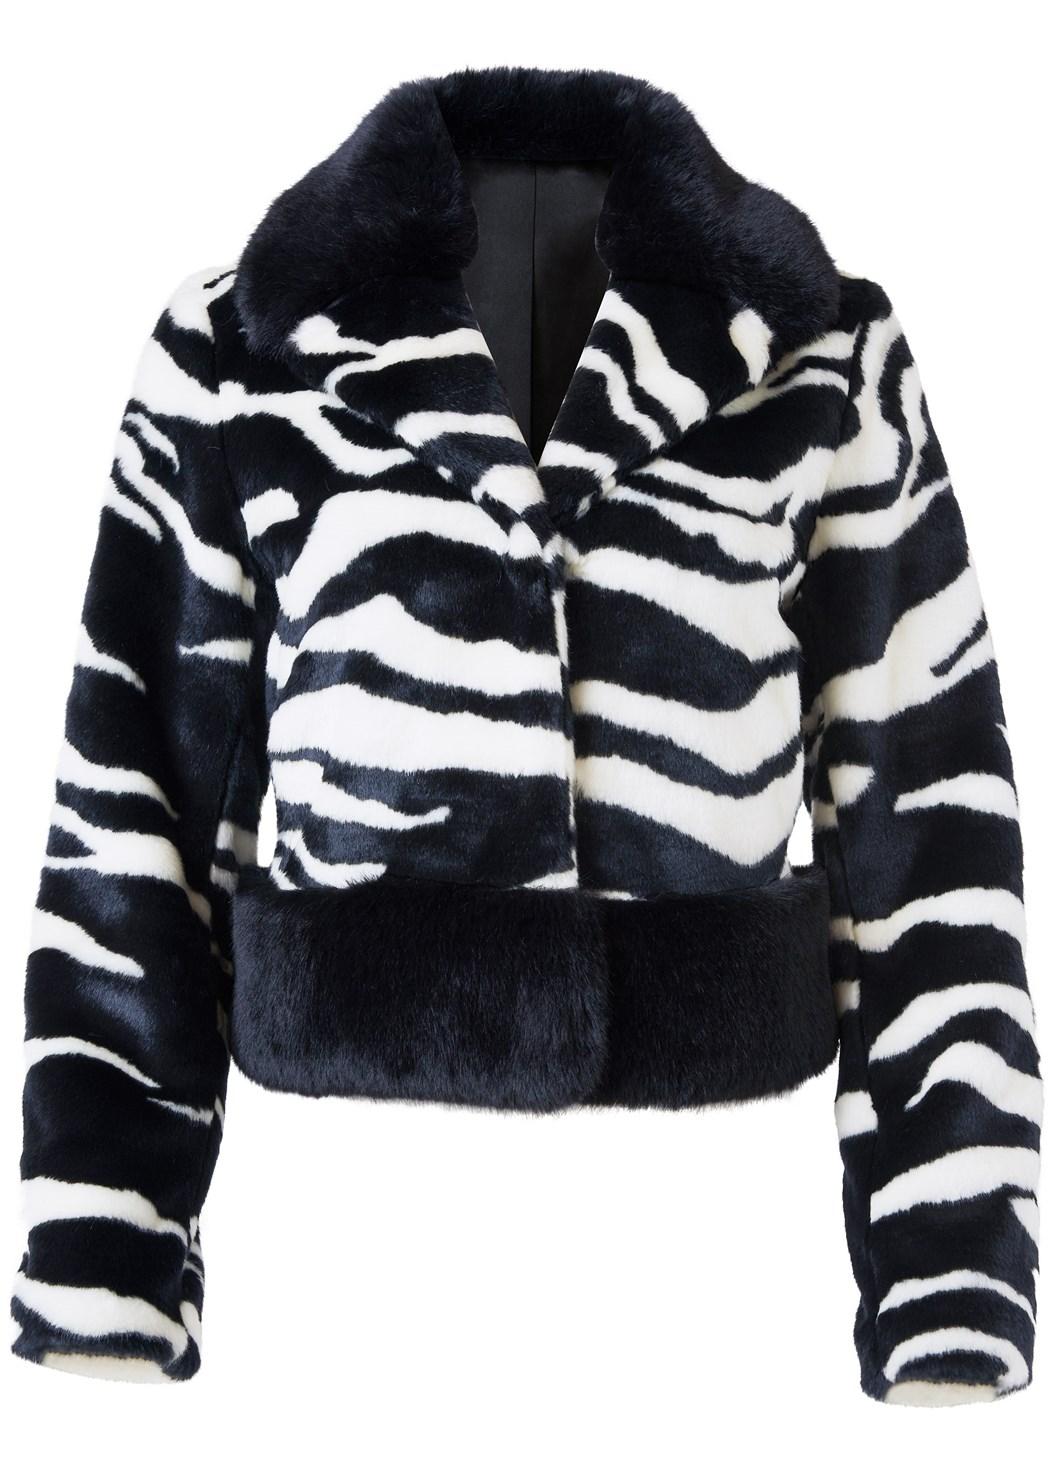 Faux Fur Zebra Print Coat,Mid Rise Slimming Stretch Jeggings